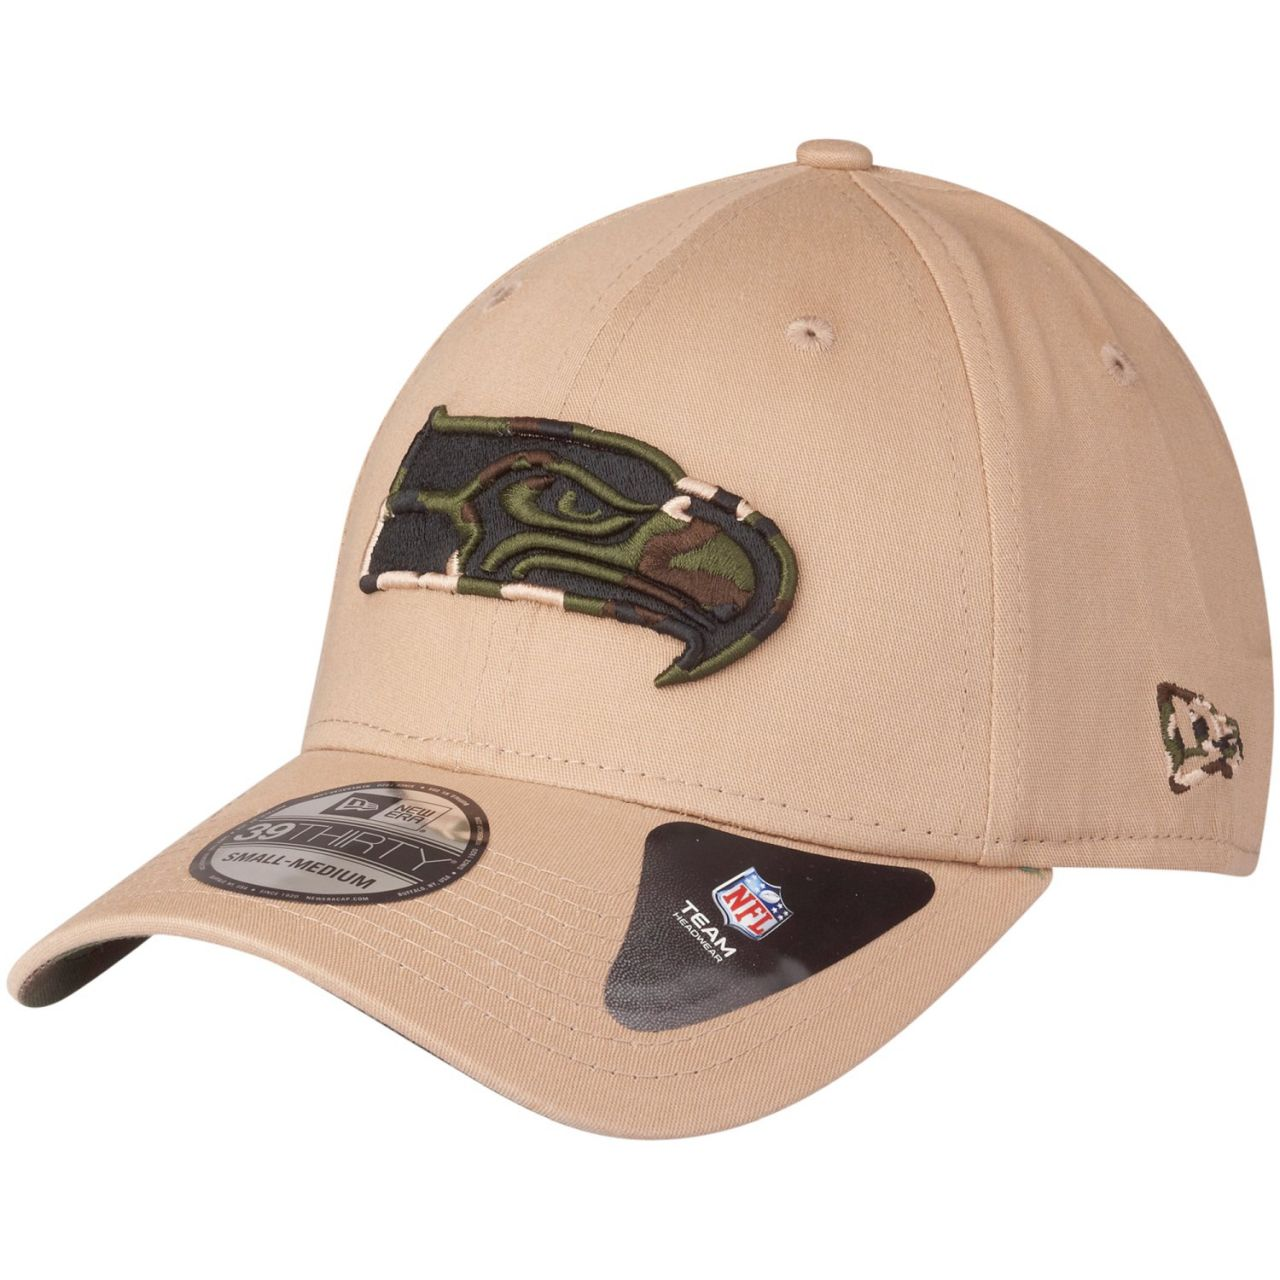 amfoo - New Era 39Thirty Stretch Cap - CAMO Seattle Seahawks